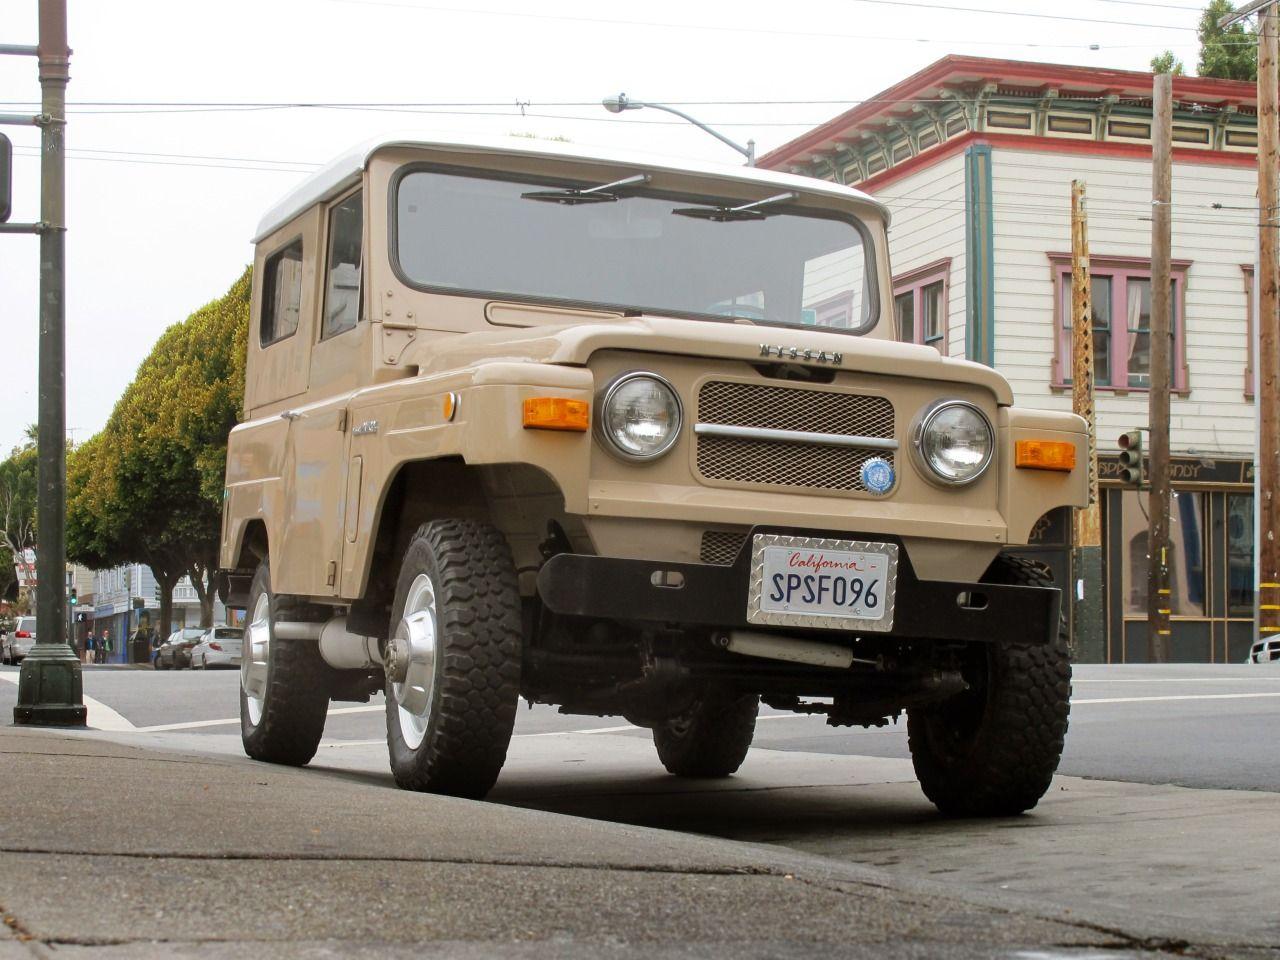 streetparkedsf: Nissan Patrol 60 | 1969 No, it's not a